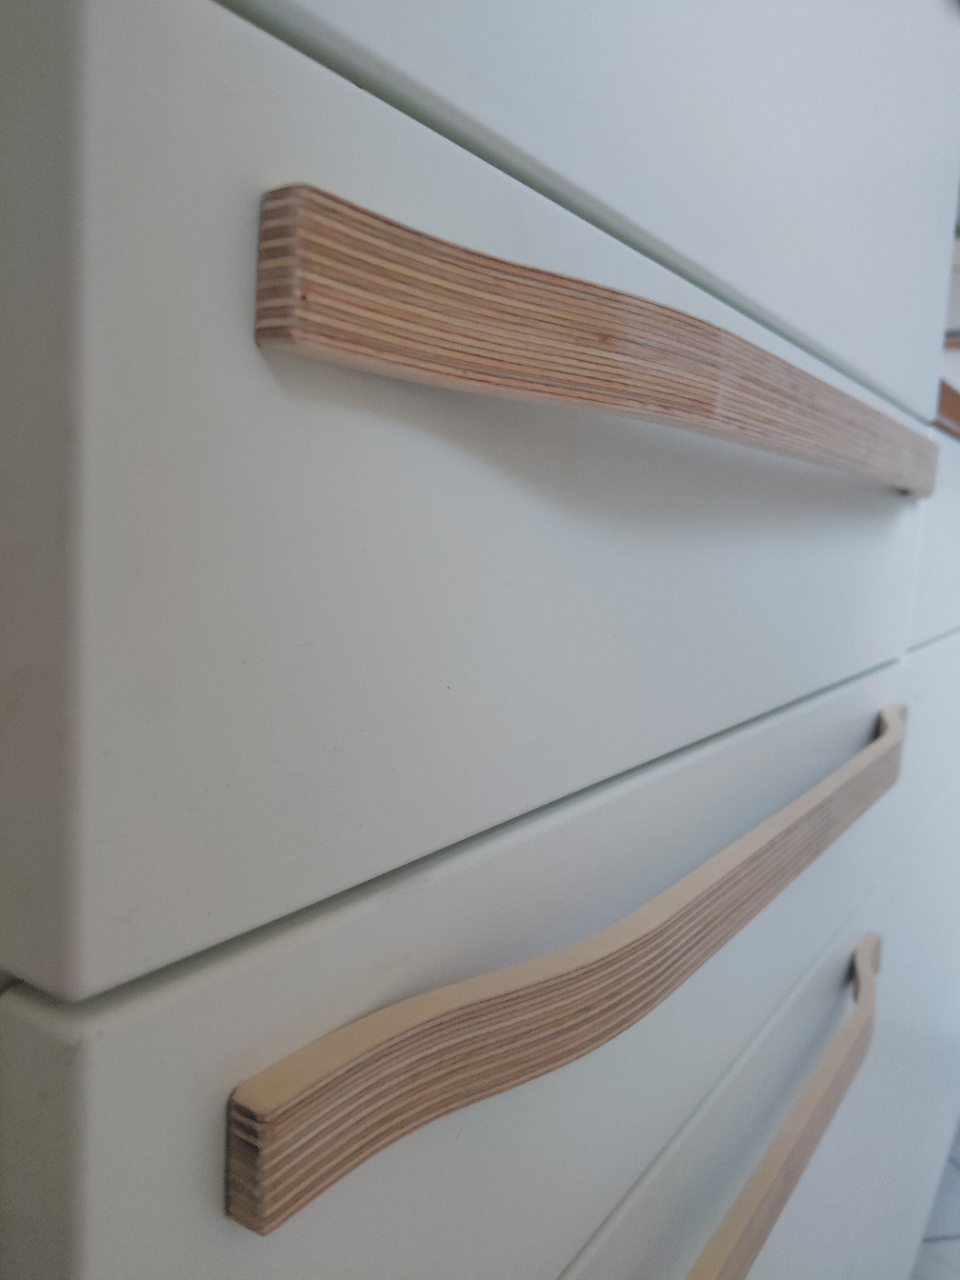 Full Size of Ausgefallene Möbelgriffe Speerholz By Daniel Speer Kleinmbel Betten Küche Wohnzimmer Ausgefallene Möbelgriffe